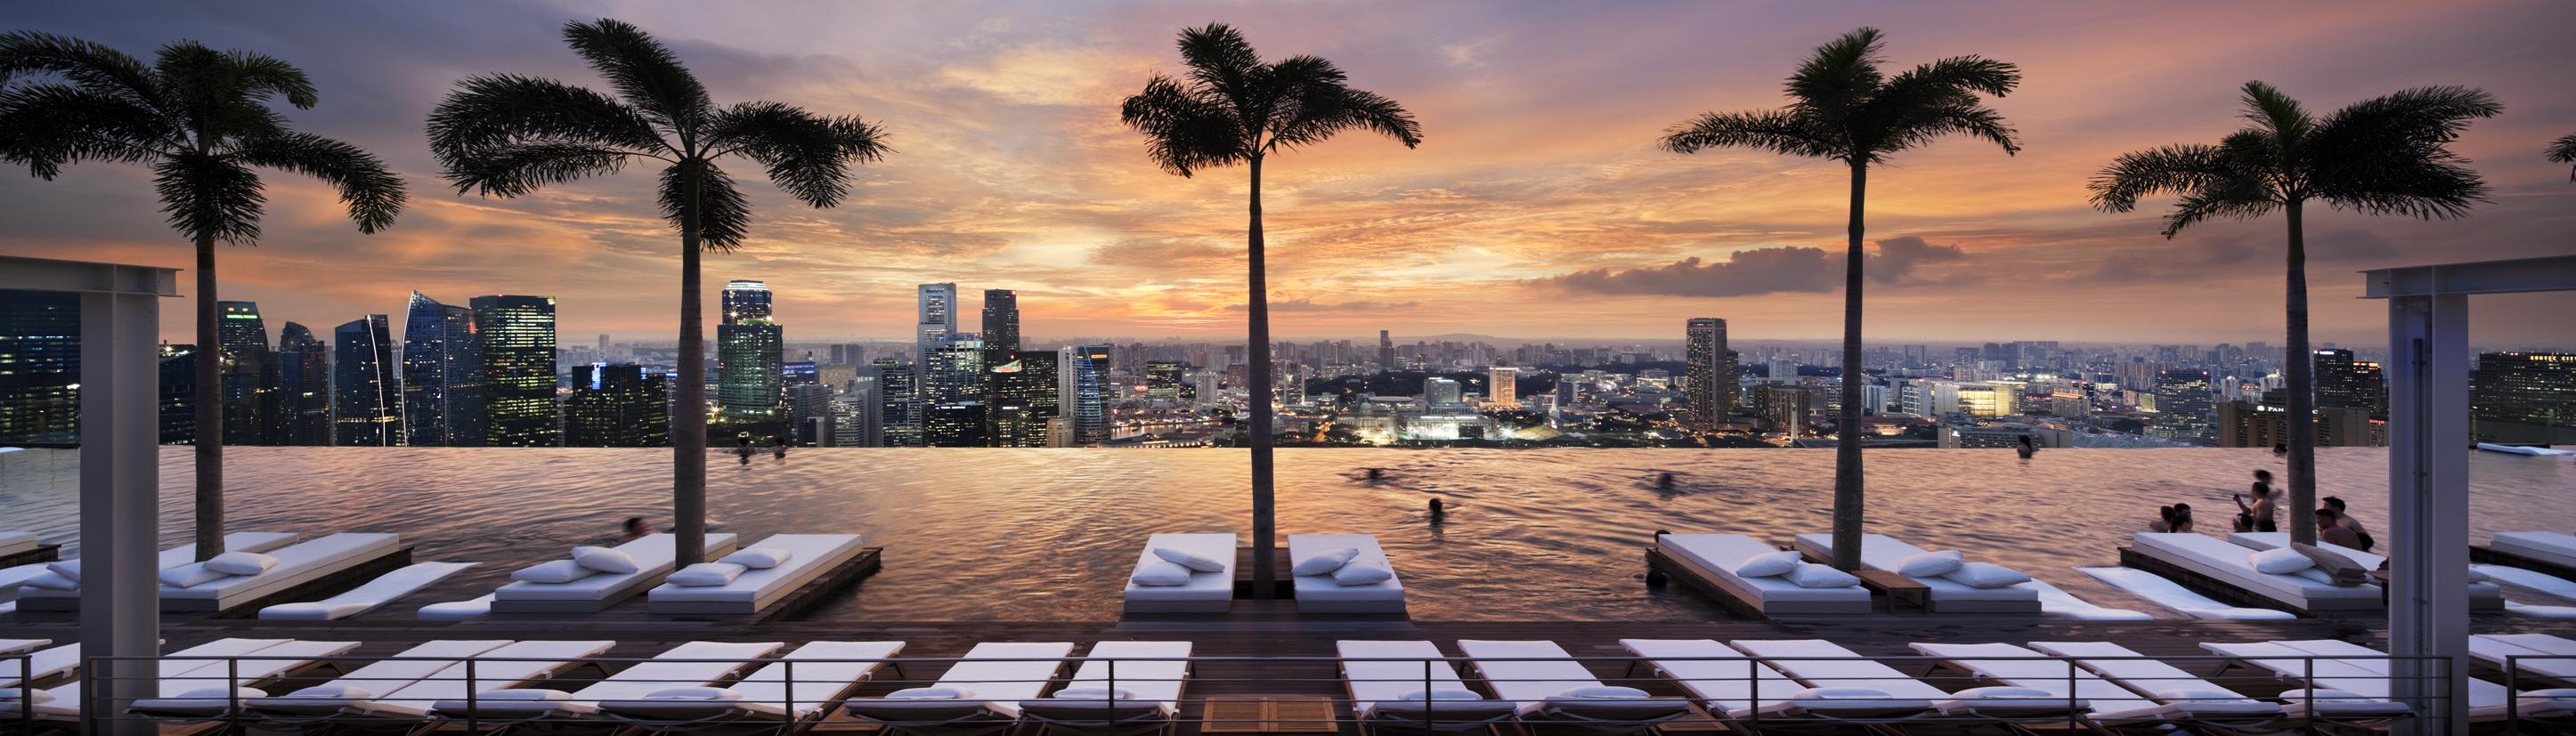 hotel marina bay sands piscina borda infinita singapura